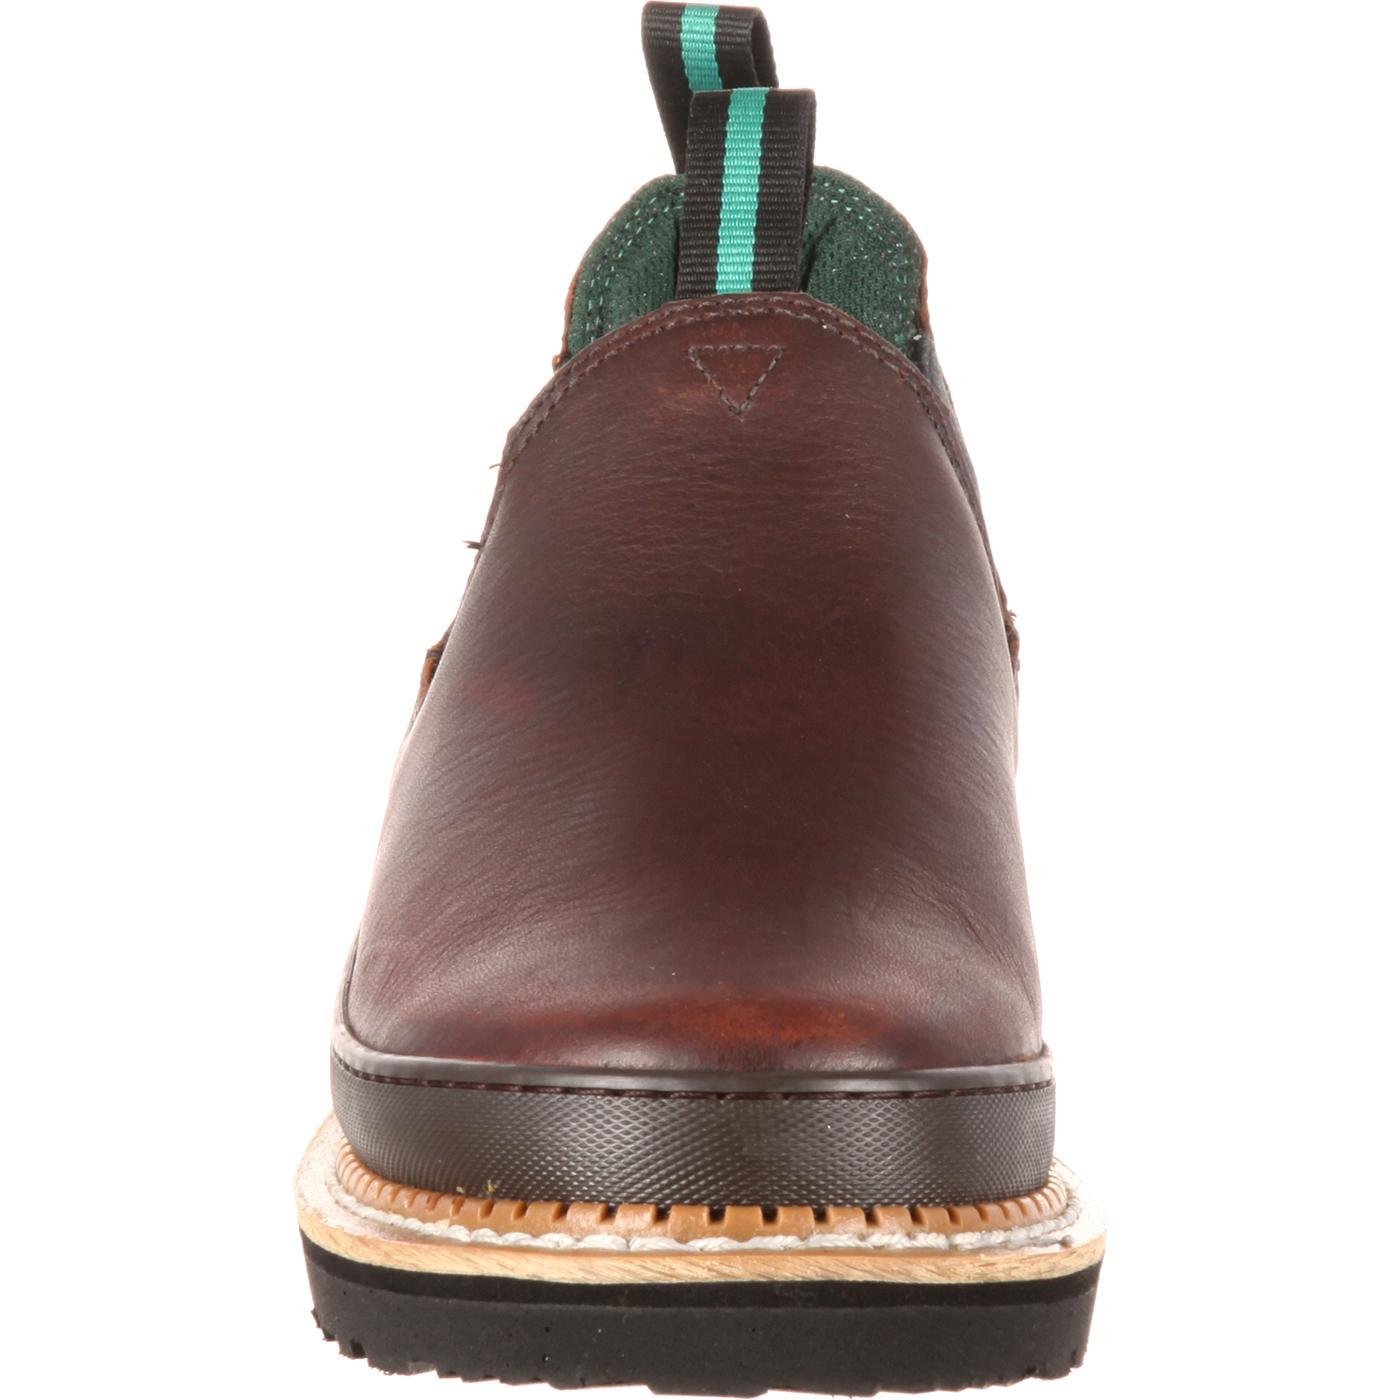 a6dc63a37ac2 Georgia Giant Romeo: Men's Leather Steel Toe Work Shoes